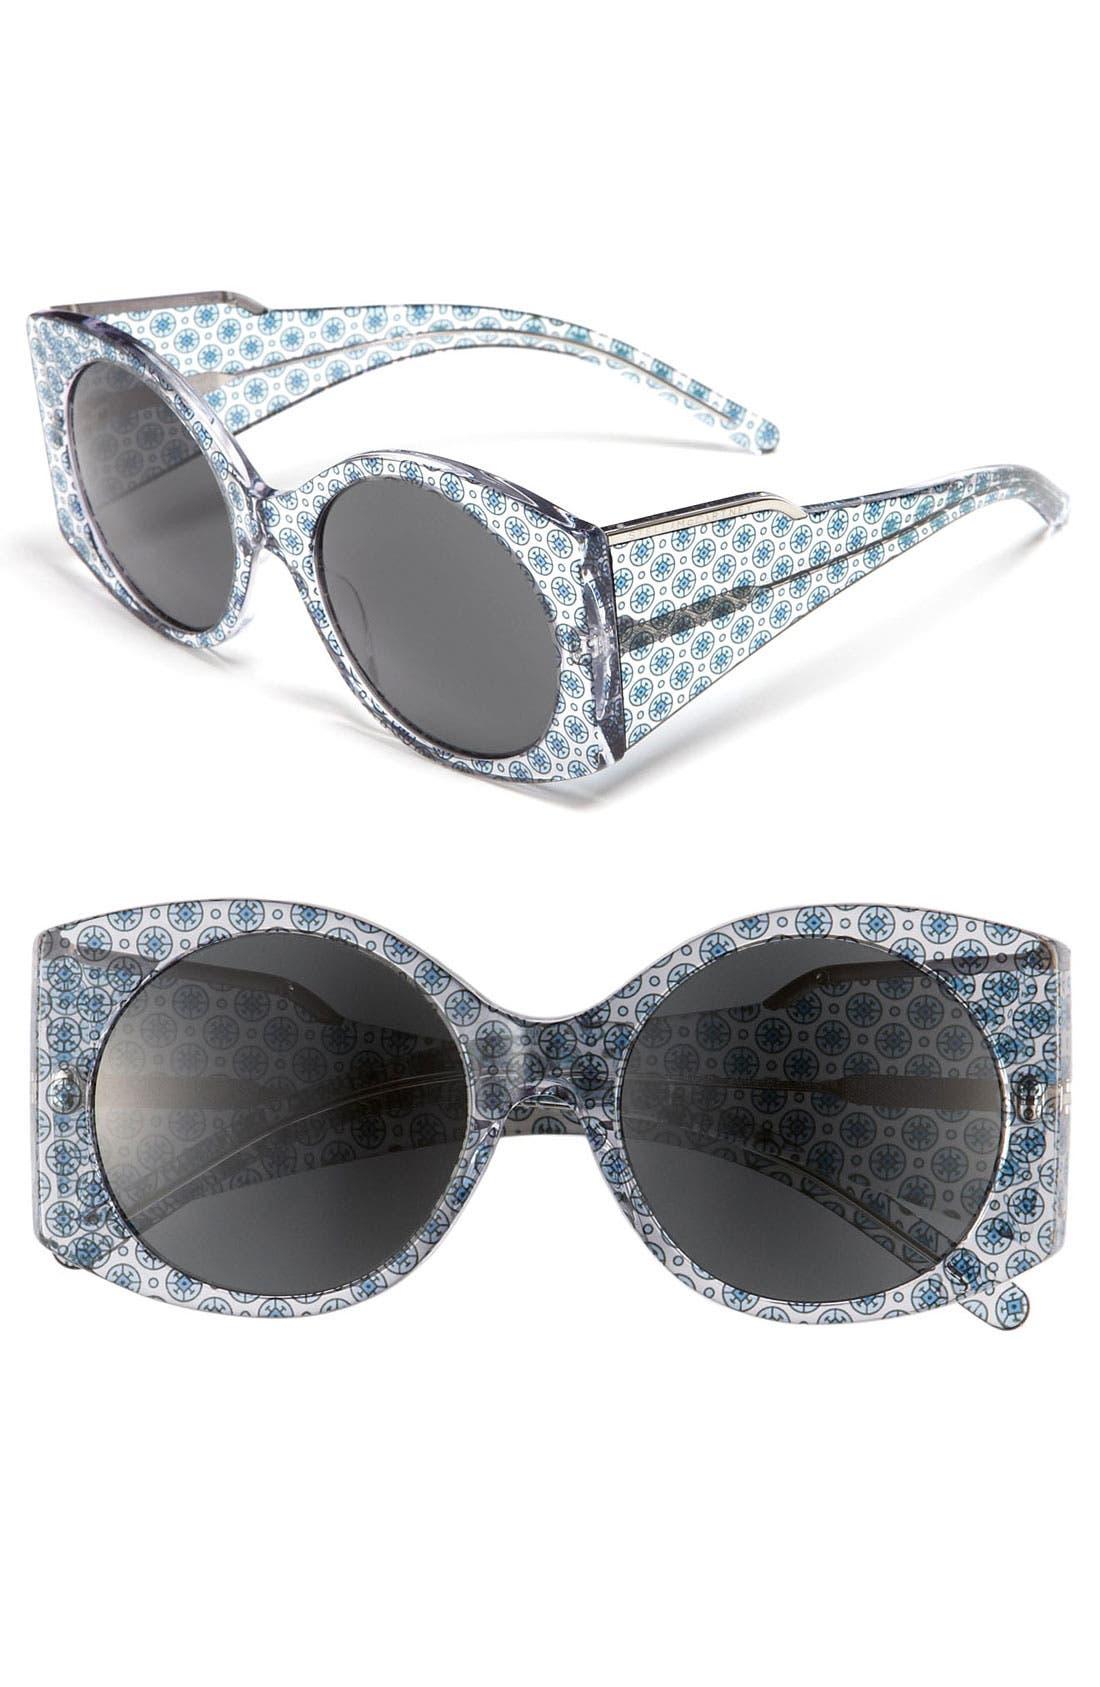 Main Image - Stella McCartney 'Summer Runway Collection' Sunglasses